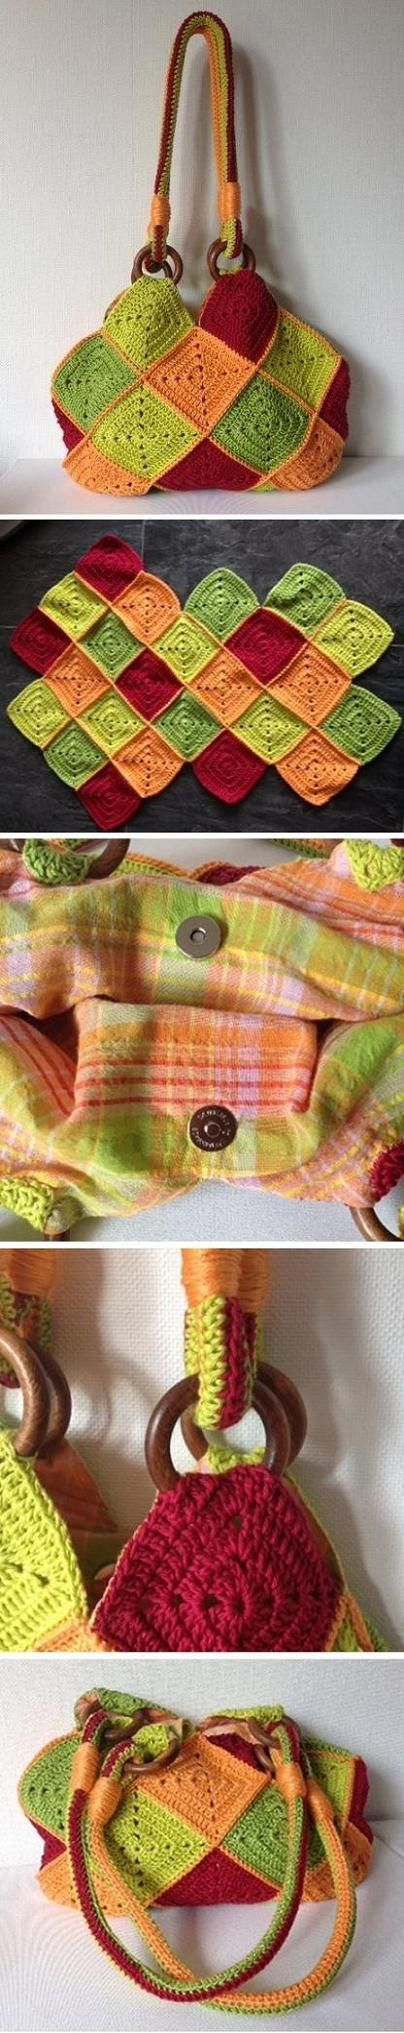 Creative+Crochet+Ideas | Creative Crochet Bag Patterns and Ideas - Life Chilli